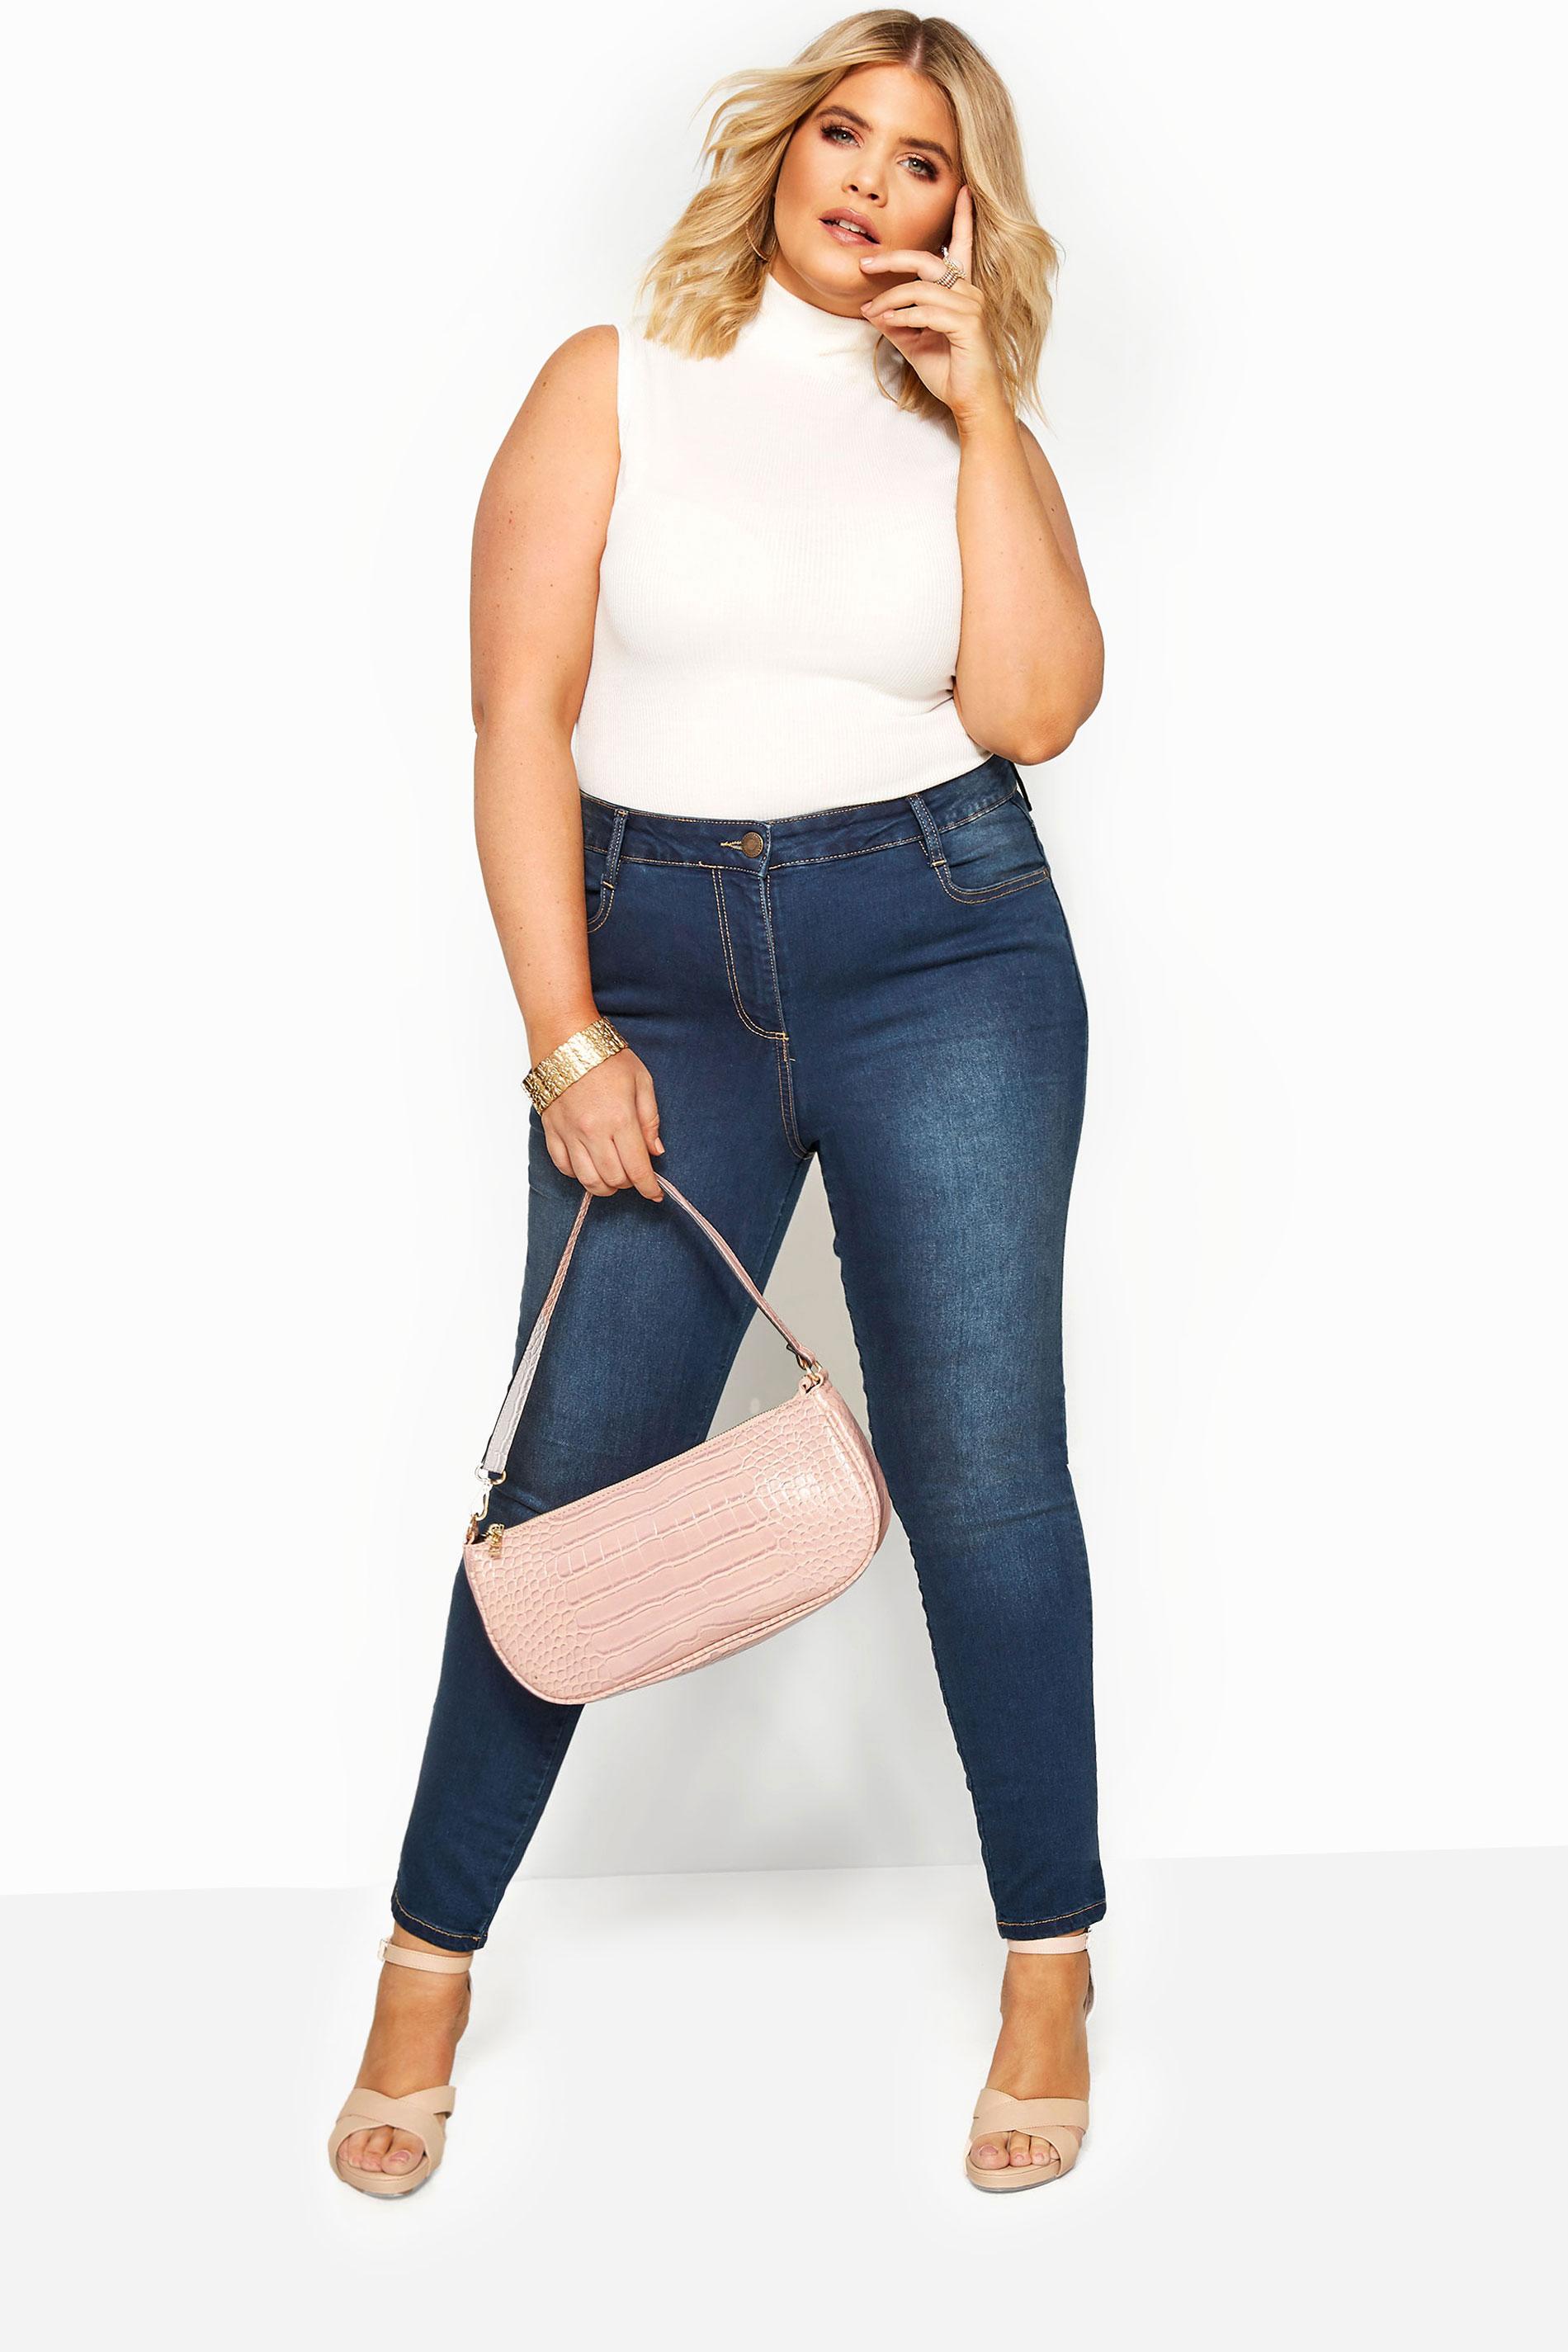 Indigo Blue Skinny Stretch AVA Jeans